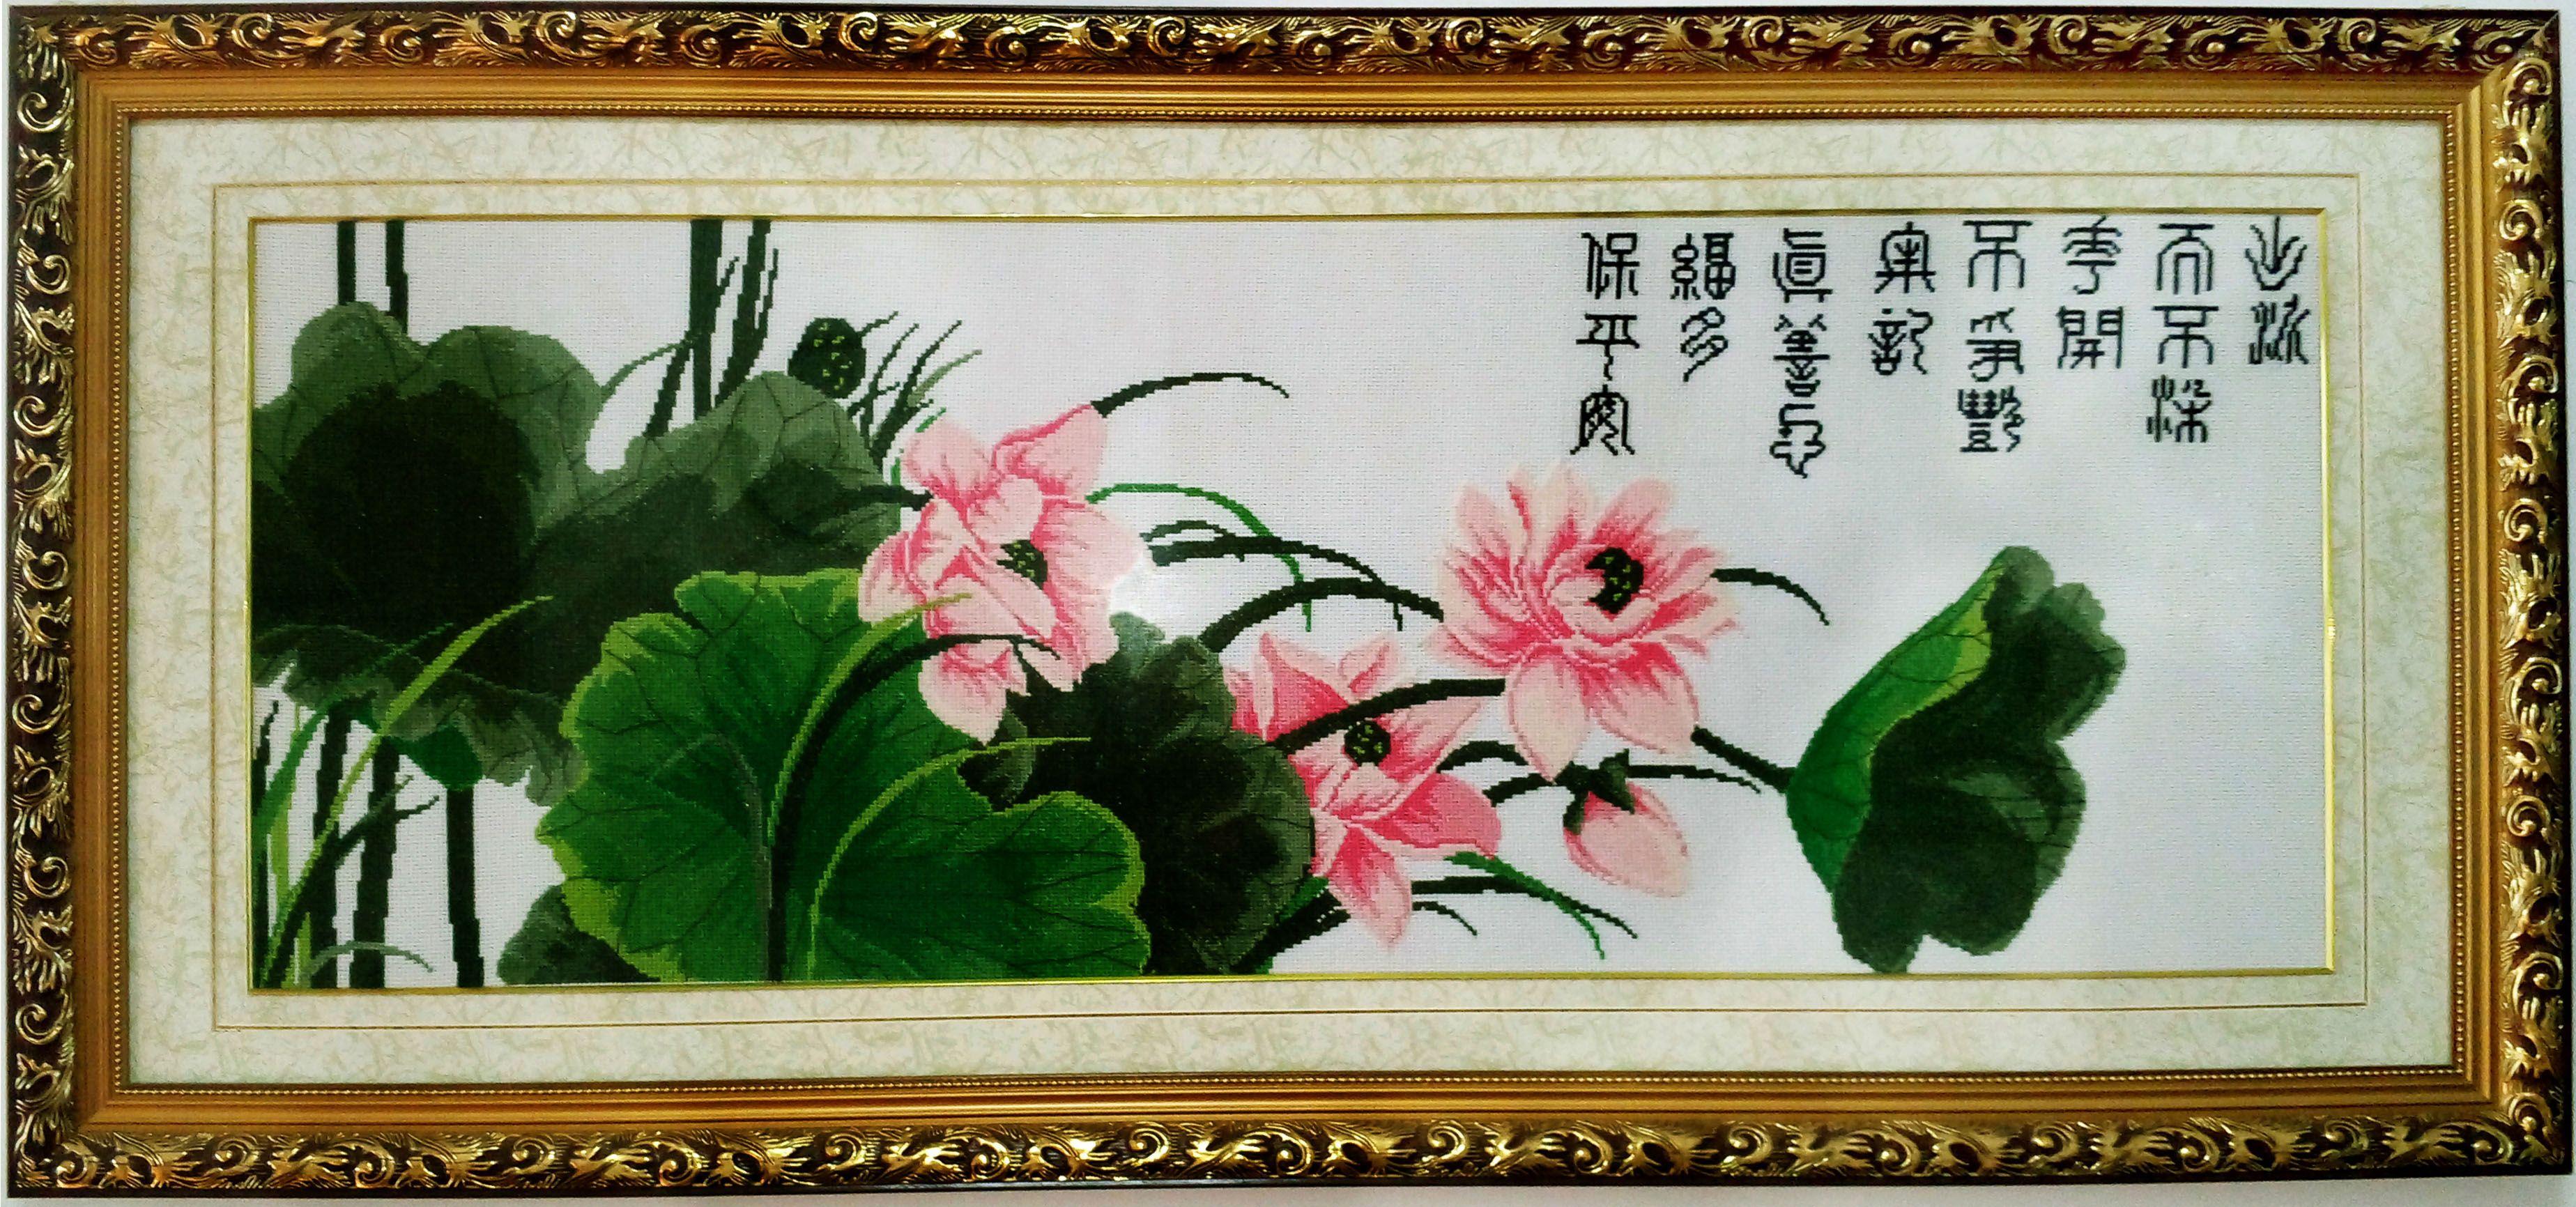 出泥而不染 花開不爭豔 牢記真善忍 福多保平安  http://big5.minghui.org/mh/article_images/2017-5-2-mh-shizixiu-fuduo.jpg